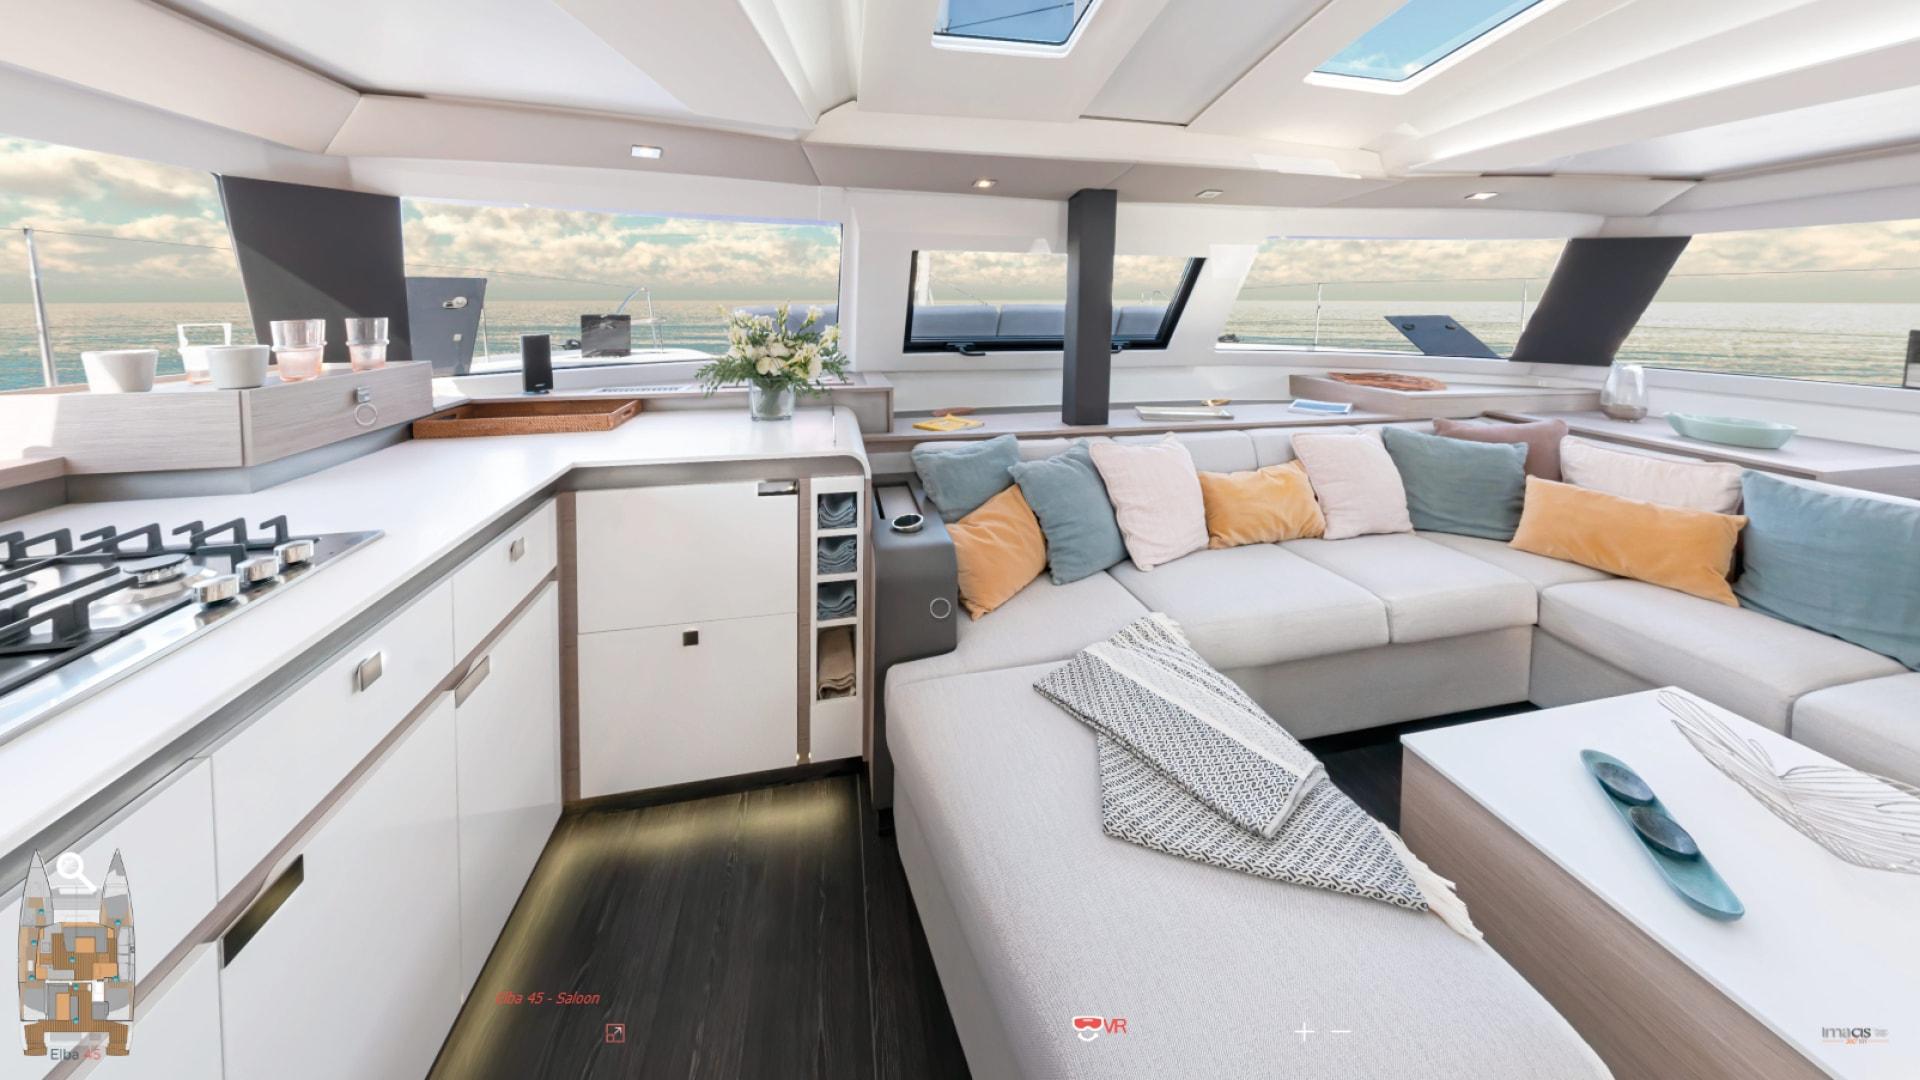 Elba-45-Virtual-tour-Sailing-catamaran-Fountaine-Pajot